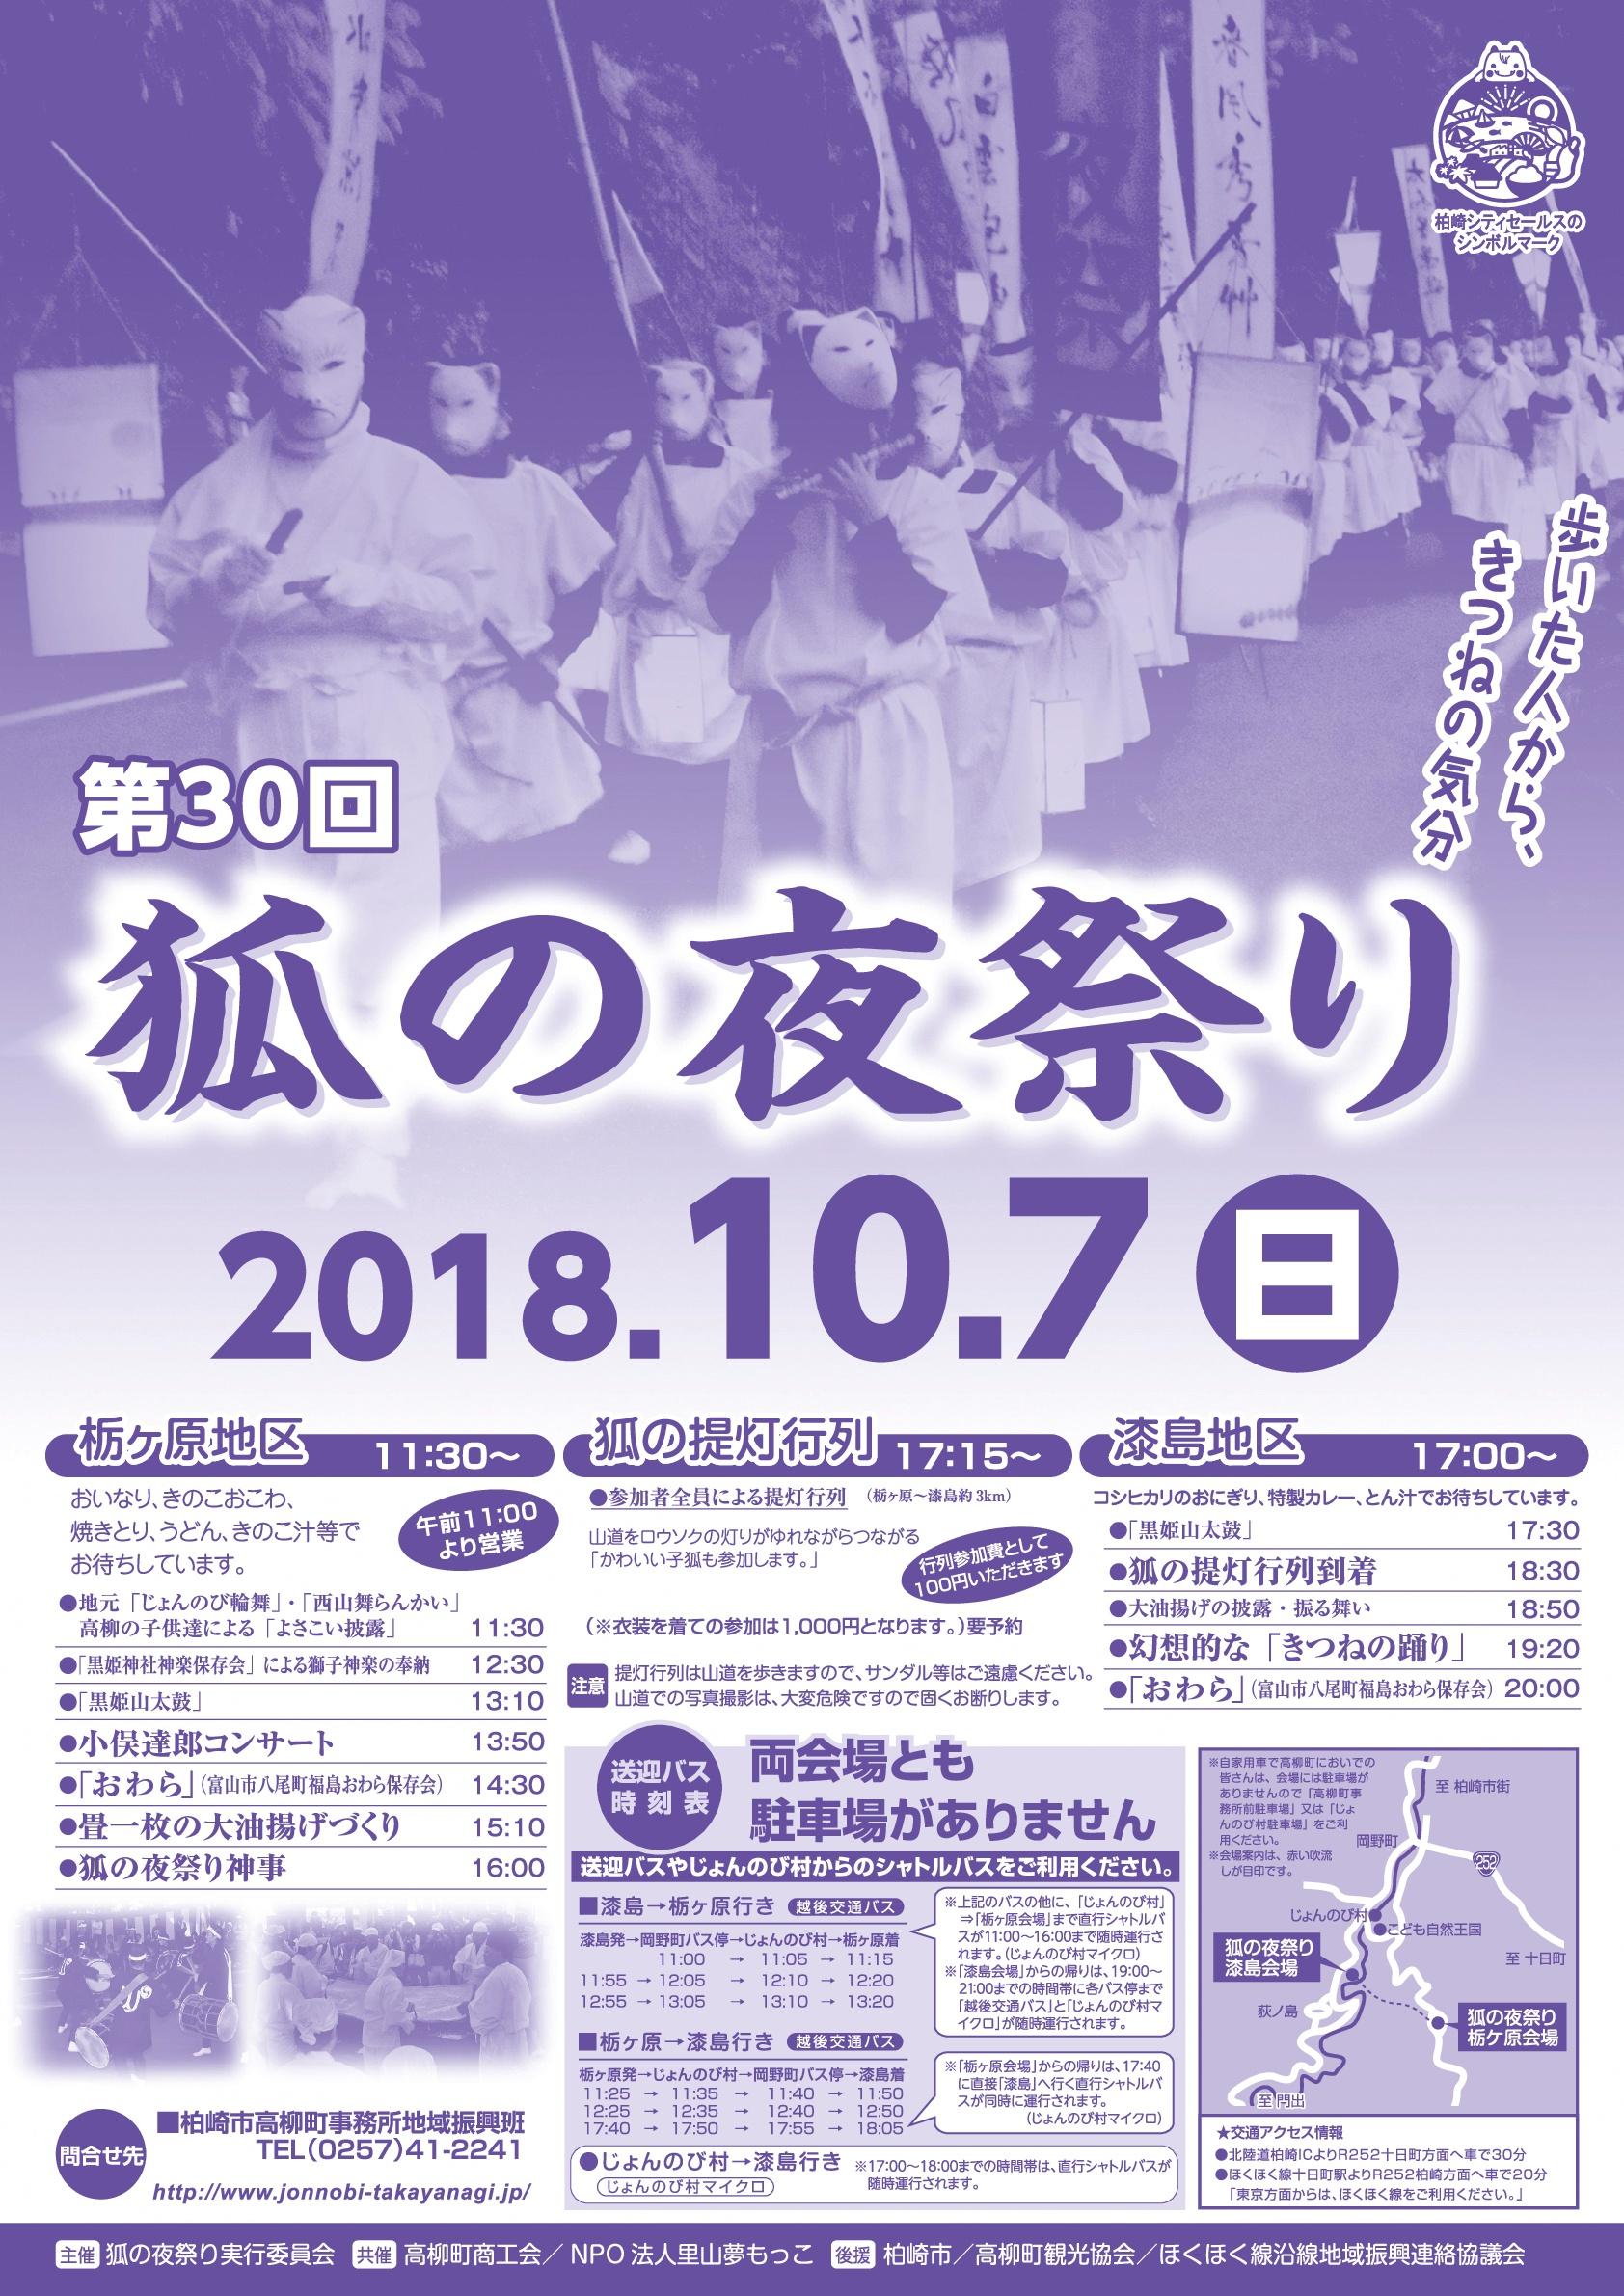 h30kitsunenoyomatsuri-001